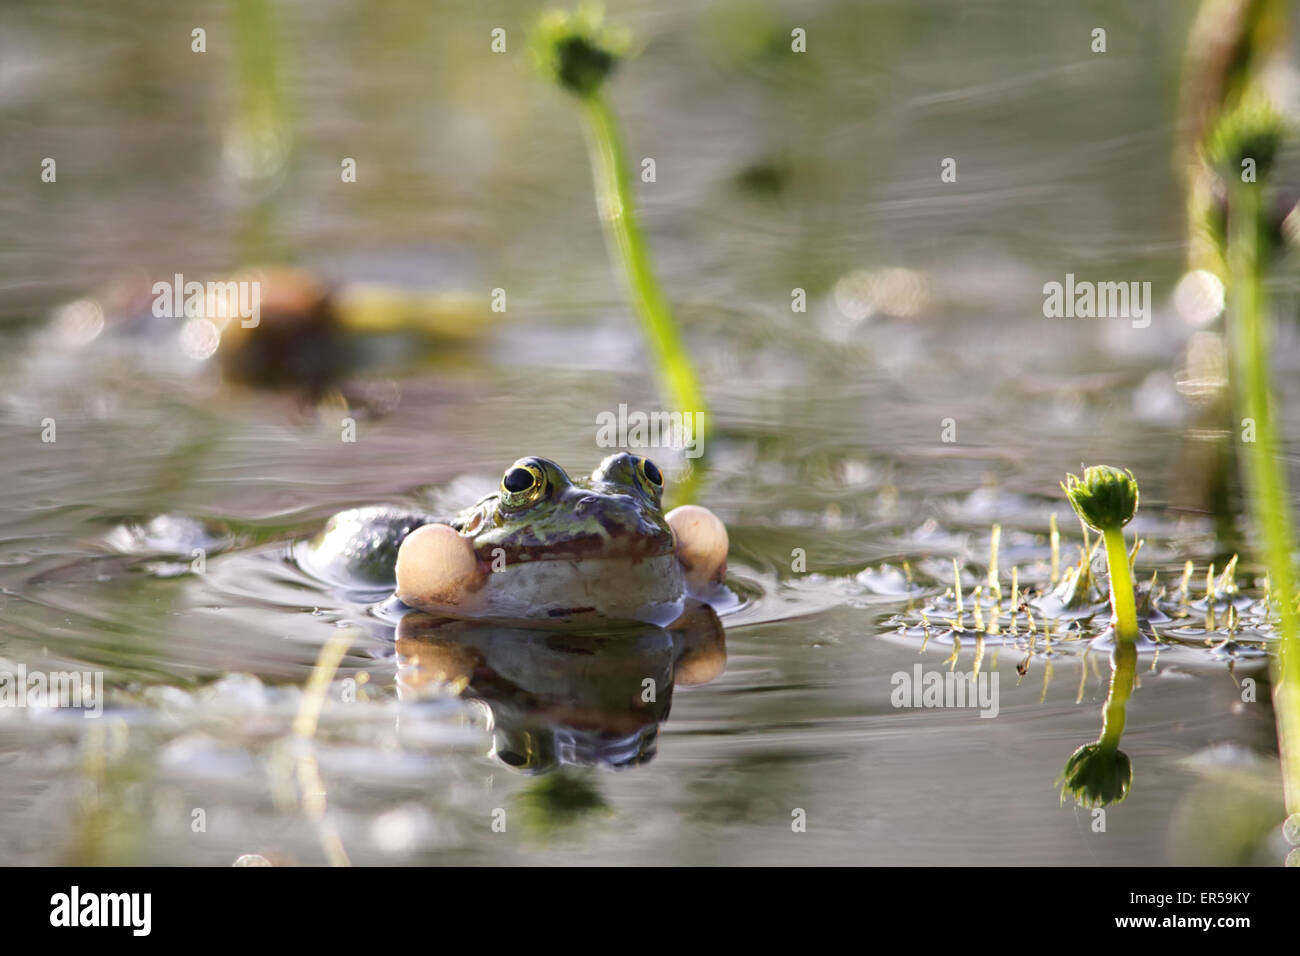 Edible frog (Pelophylax esculentus) croaking in a pond in Frankfurt, Germany in spring. - Stock Image